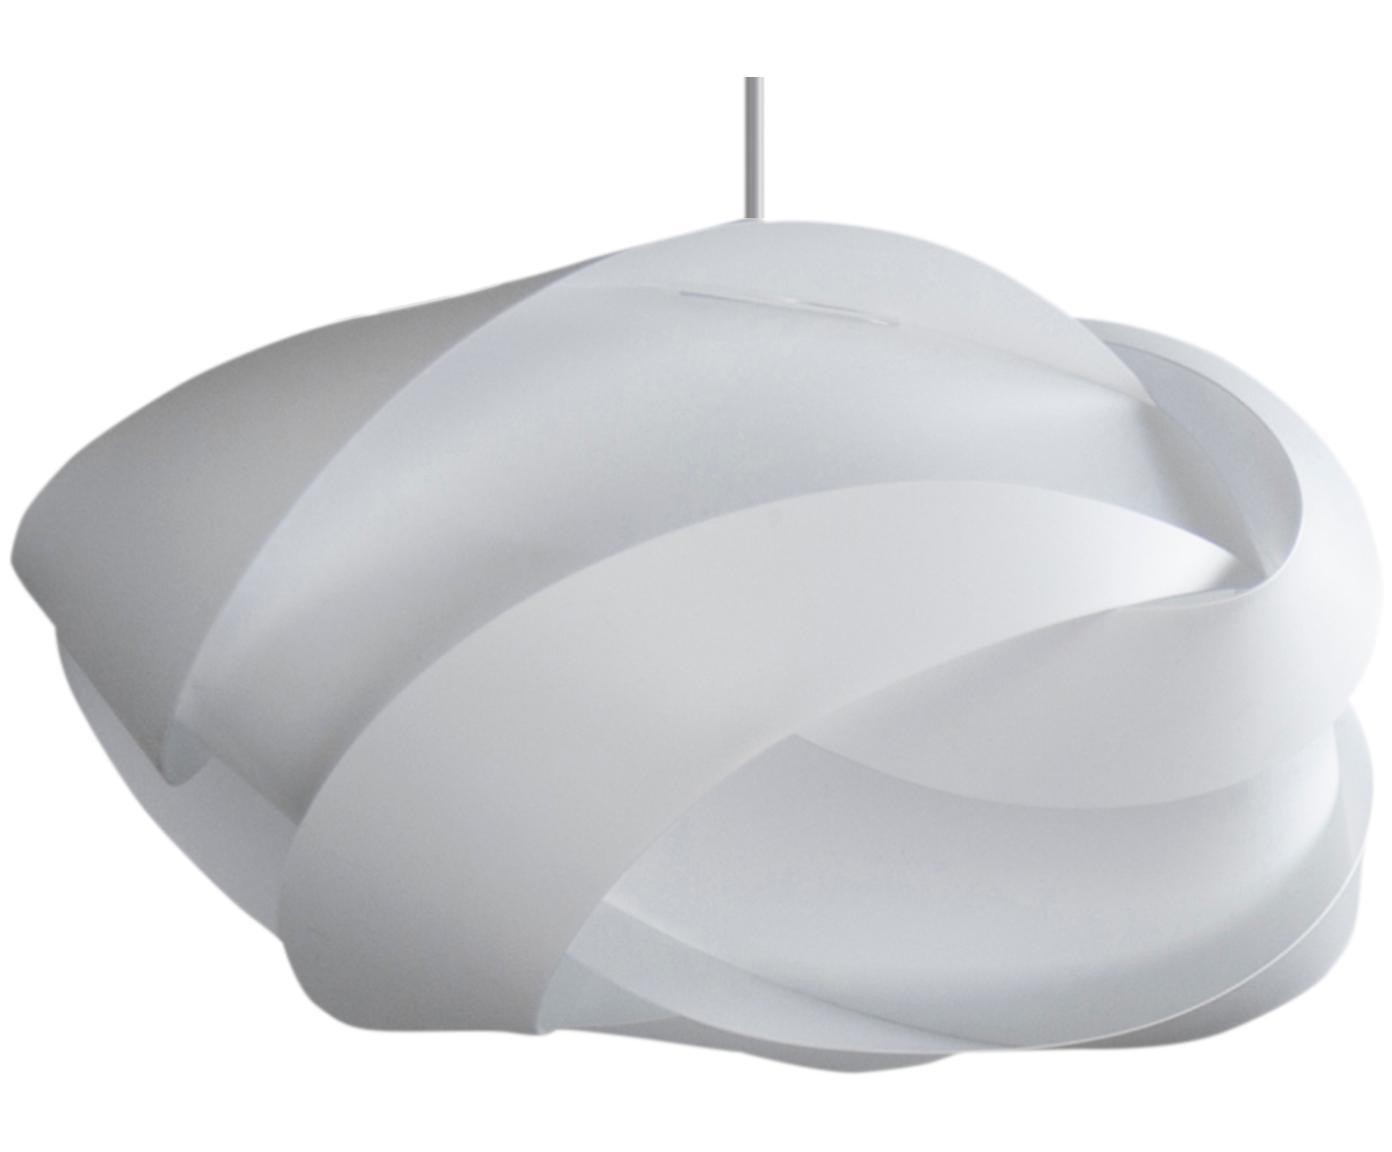 Lampada a sospensione Ribbon, Paralume: polipropilene, policarbon, Baldacchino: materiale sintetico, Bianco, Ø 33 x Alt. 19 cm